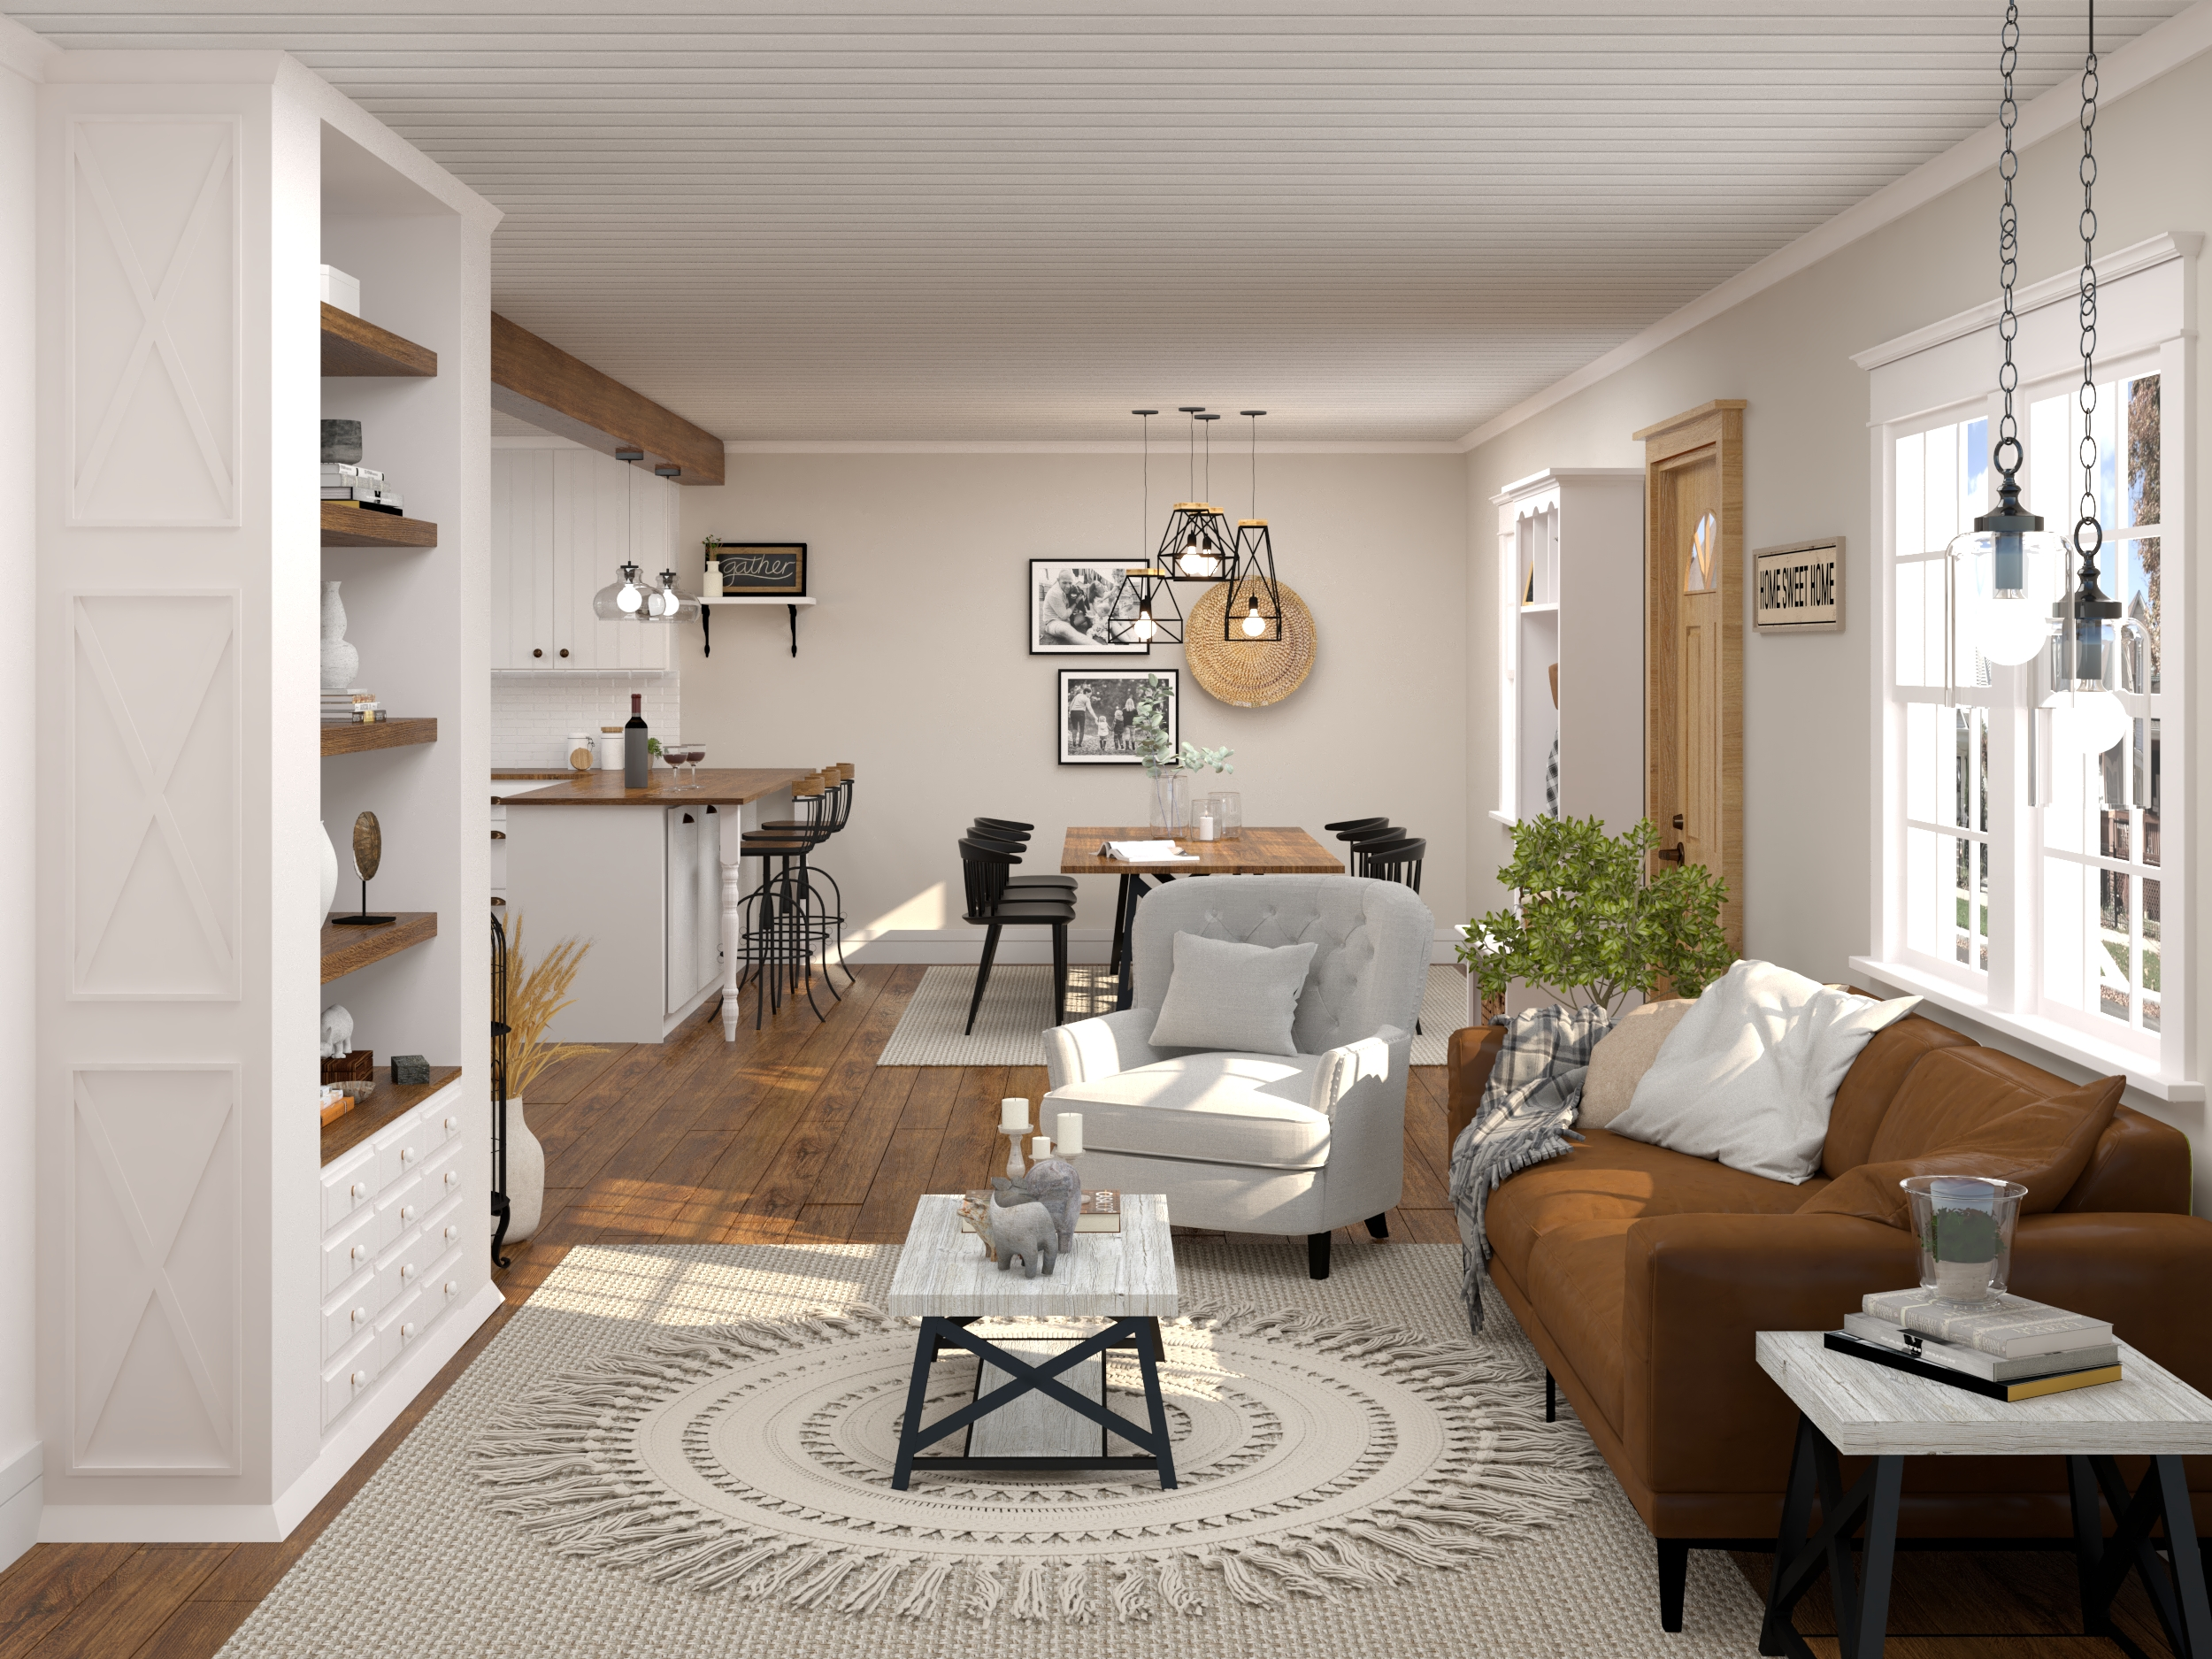 3D rendering of a living room design